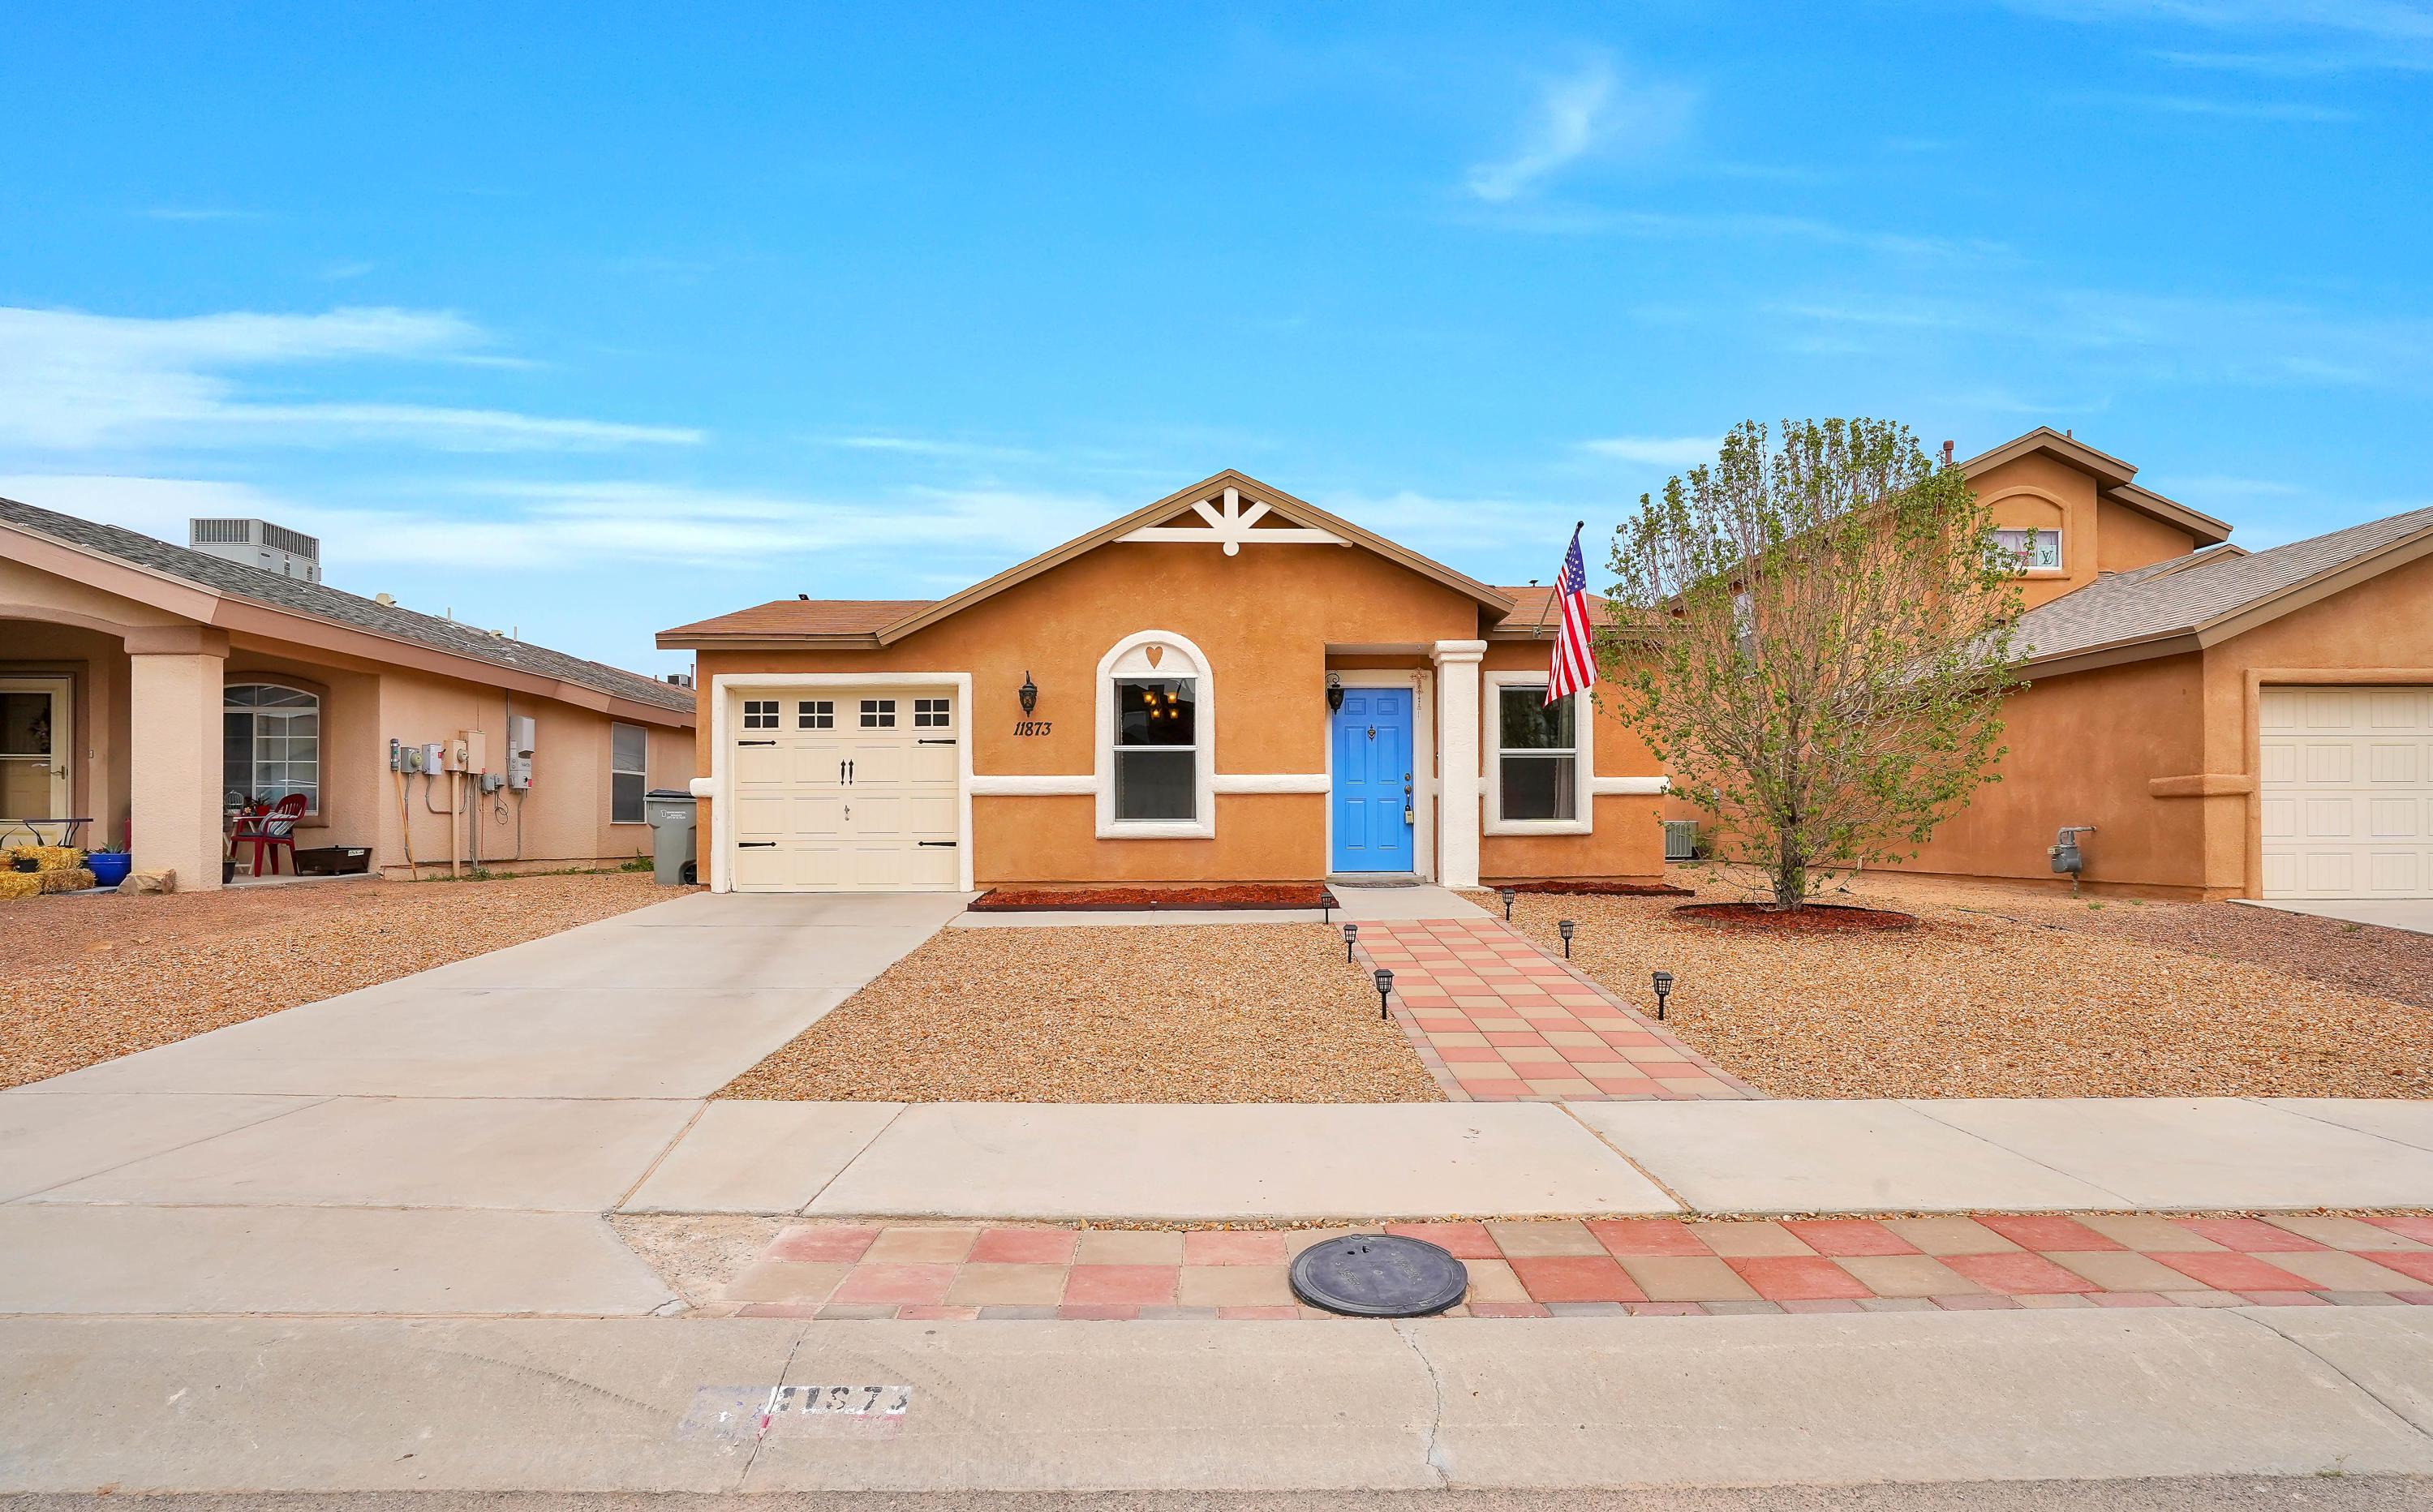 11873 Mesquite Rock, El Paso, Texas 79934, 3 Bedrooms Bedrooms, ,2 BathroomsBathrooms,Residential,For sale,Mesquite Rock,844335